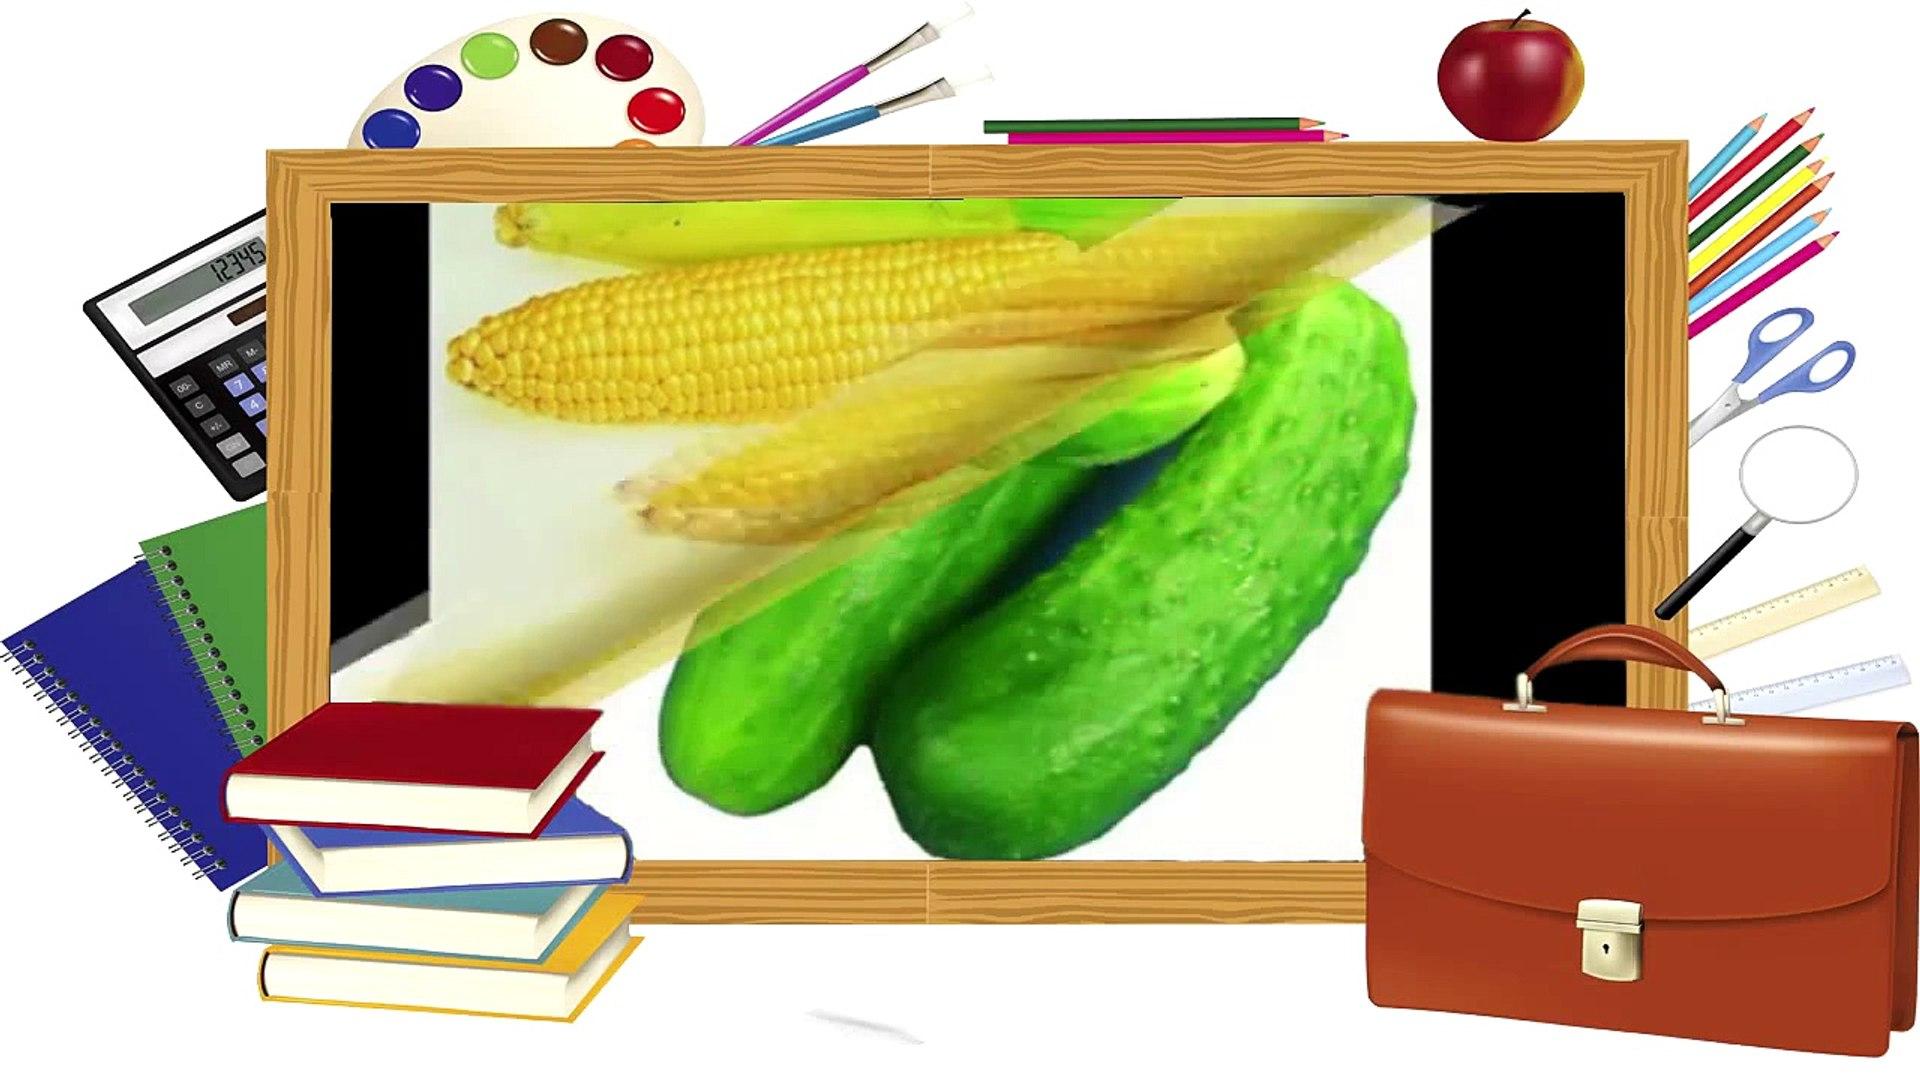 Развивающиймультфильм Овощи для детей